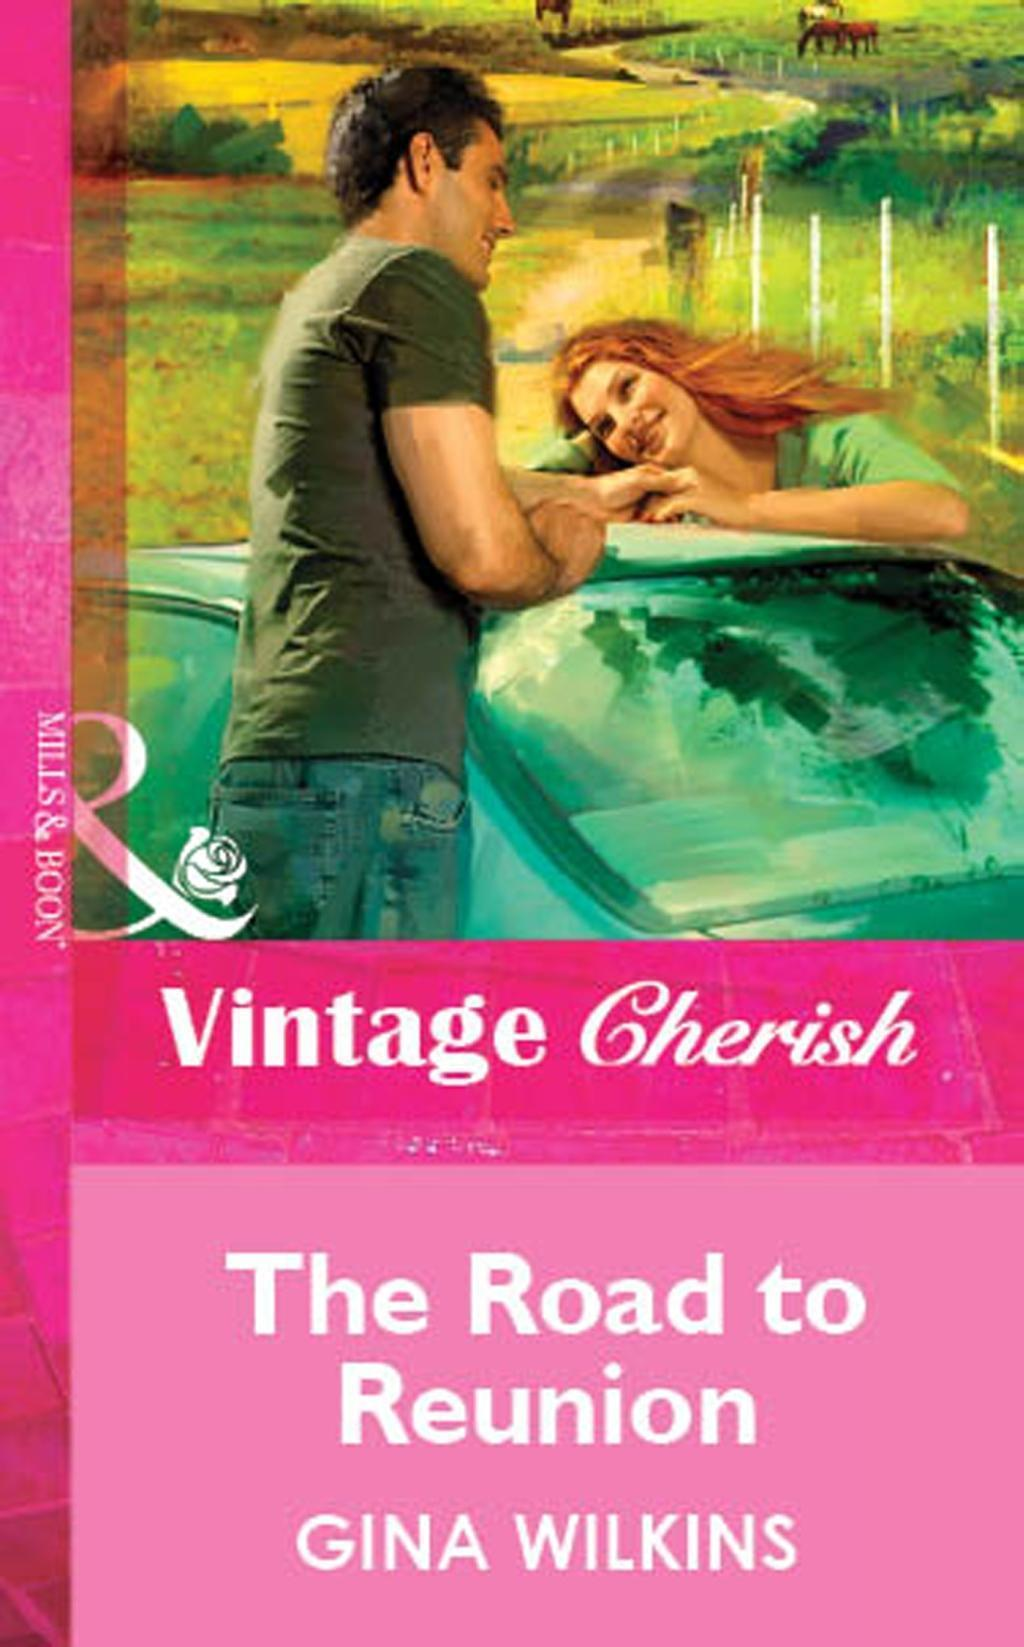 The Road to Reunion (Mills & Boon Vintage Cherish)